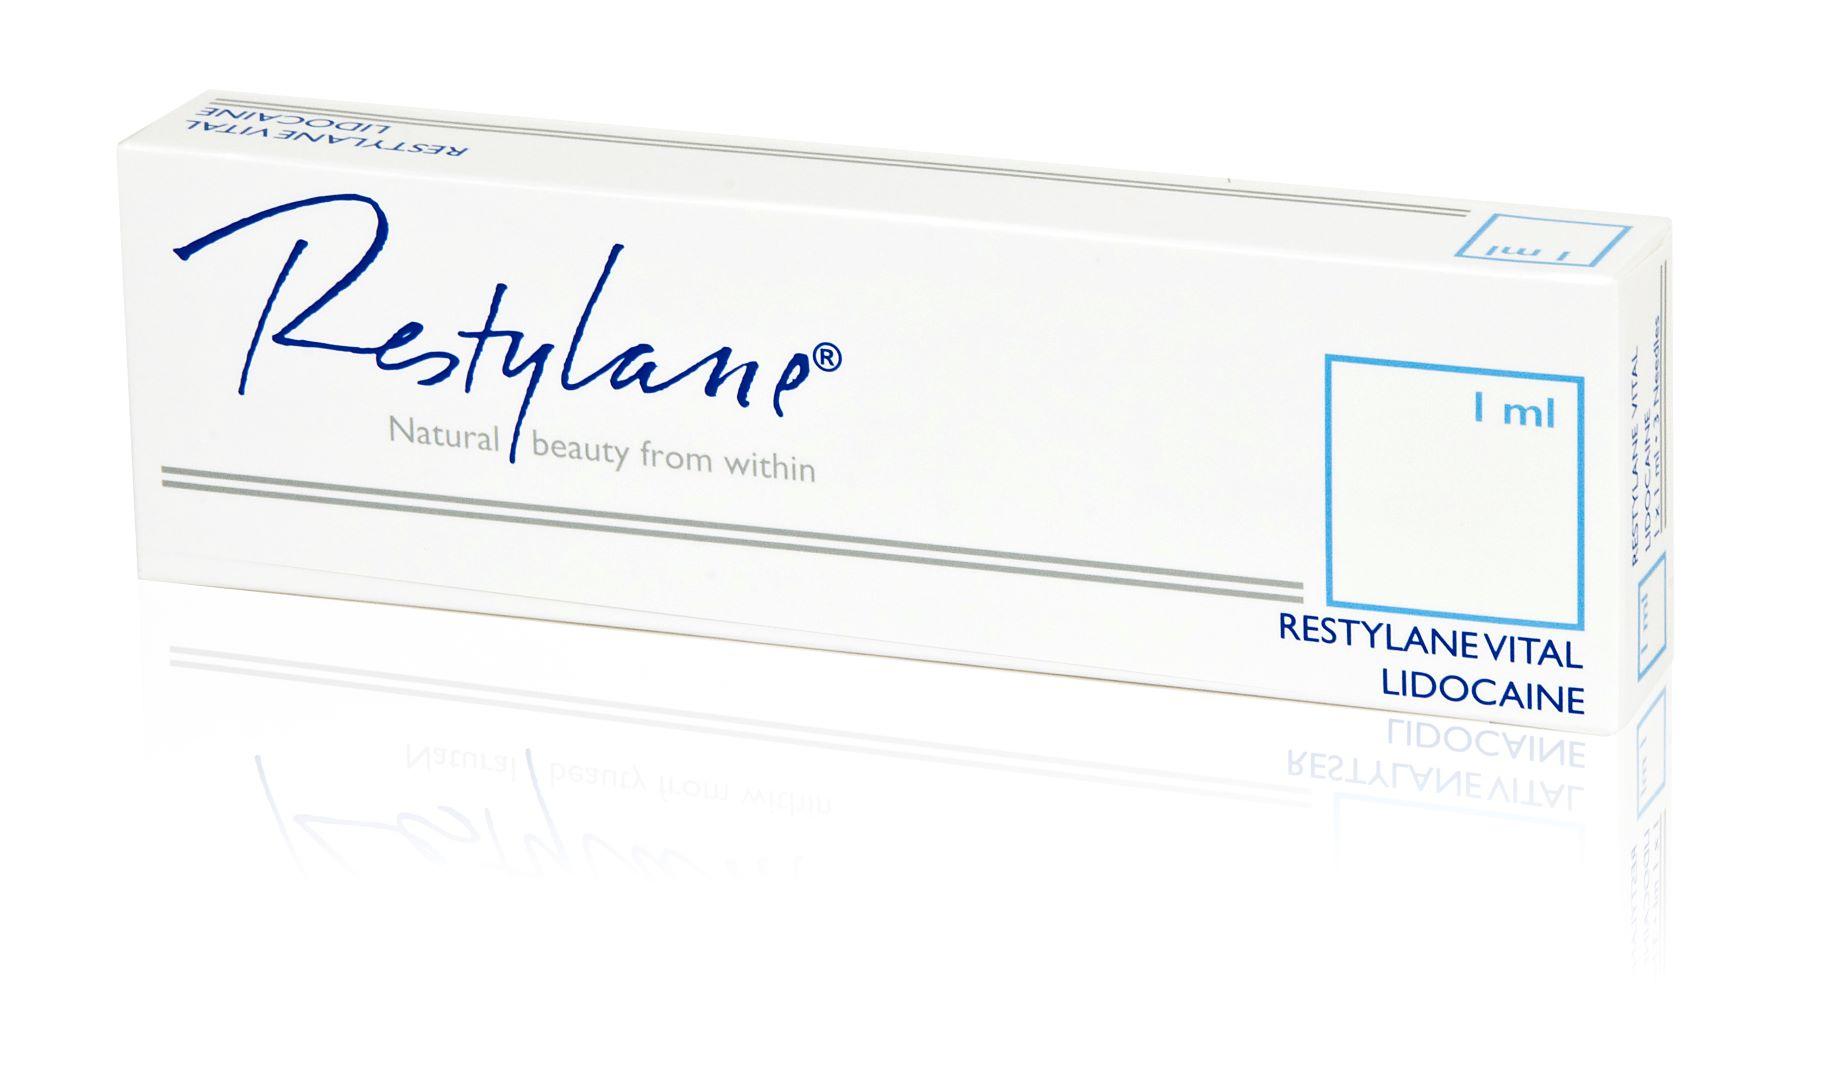 Restylane Vital